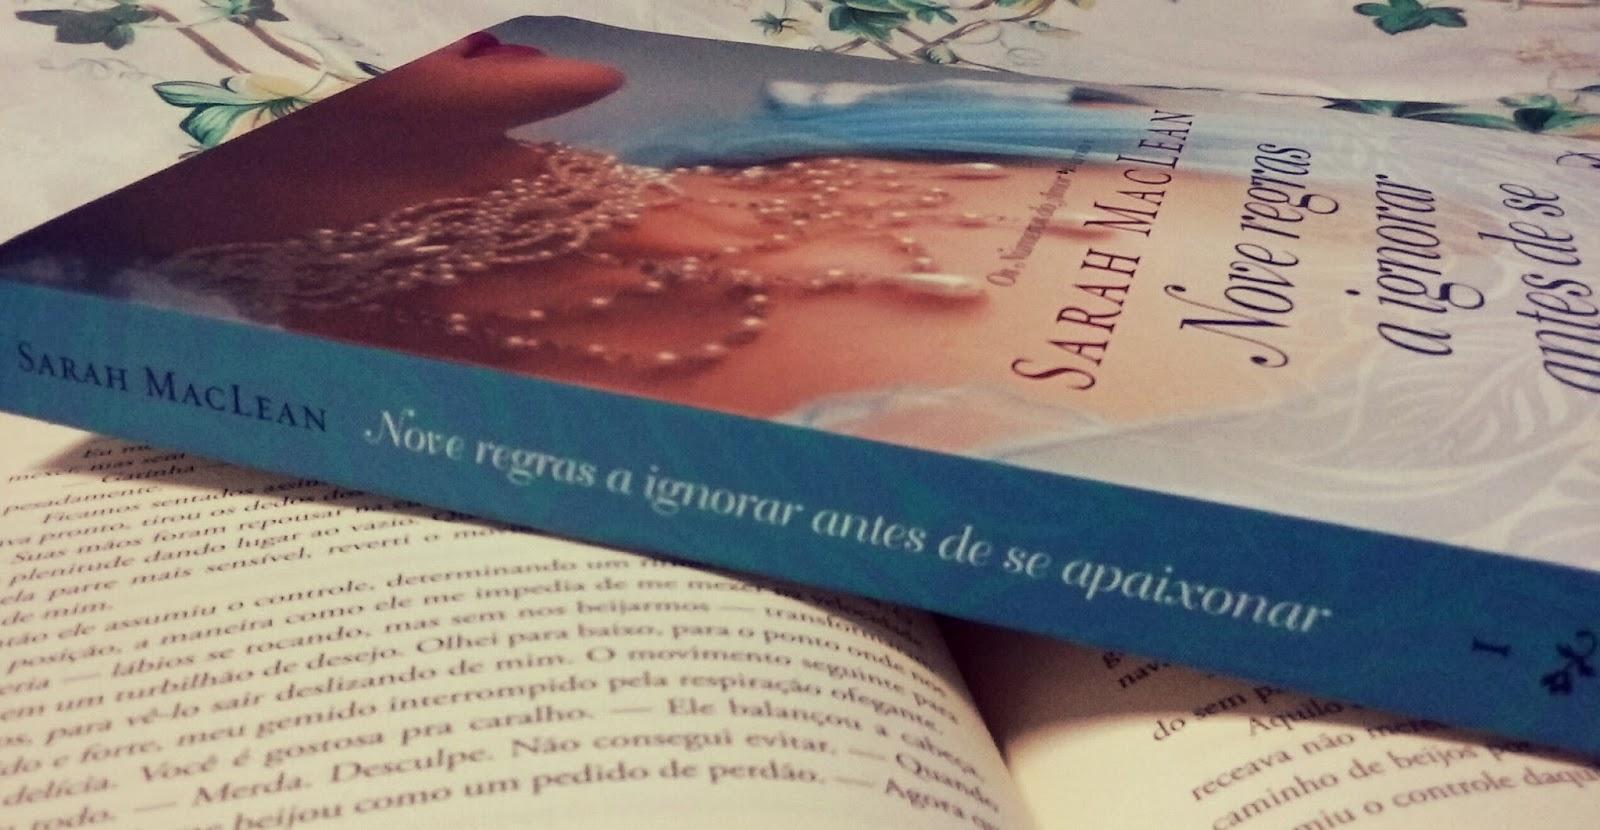 Nove Regras a Ignorar Antes de Se Apaixonar